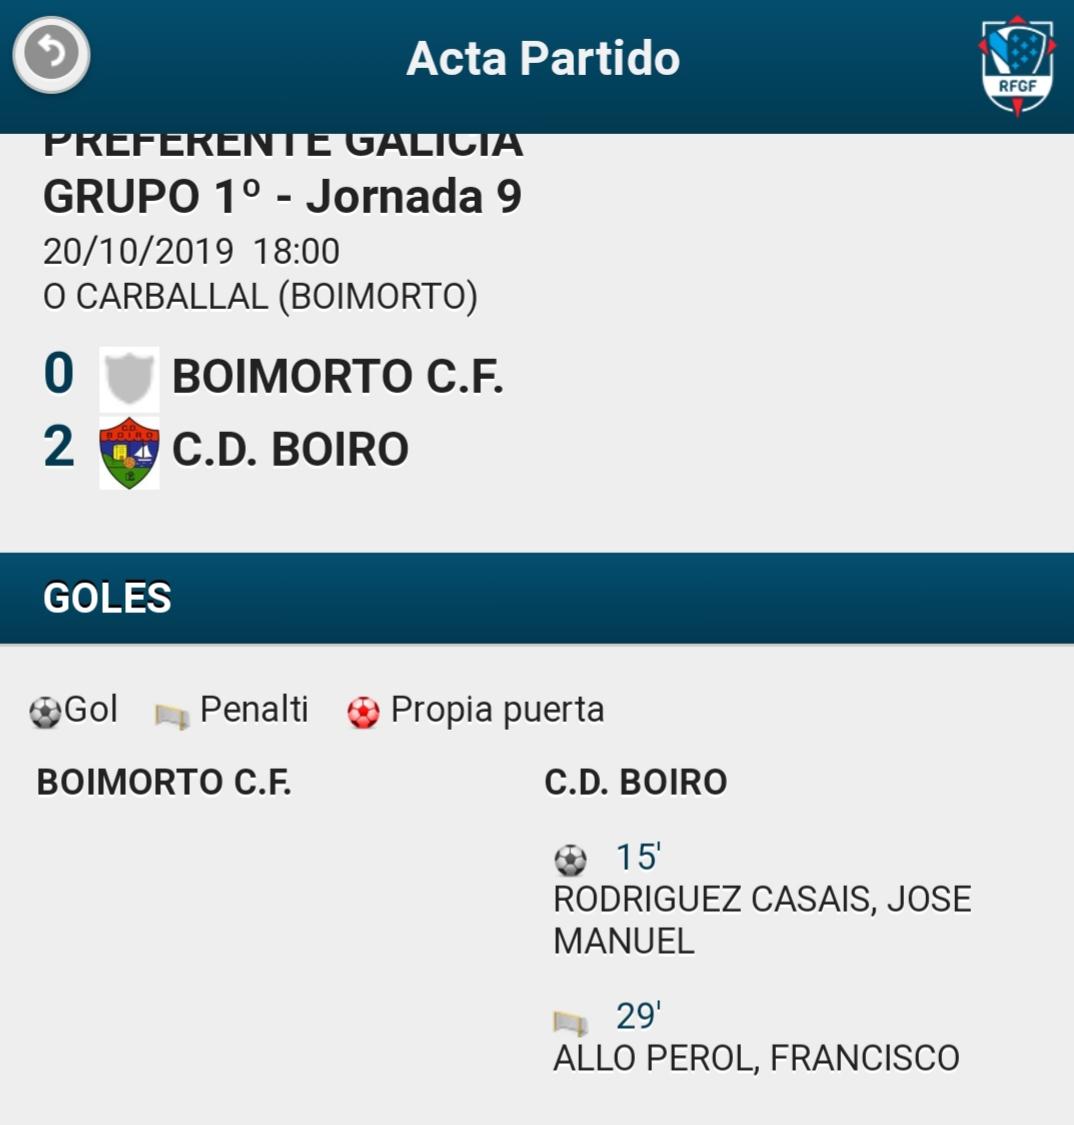 VICTORIA DO C.D. BOIRO EN BOIMORTO POR  0-2